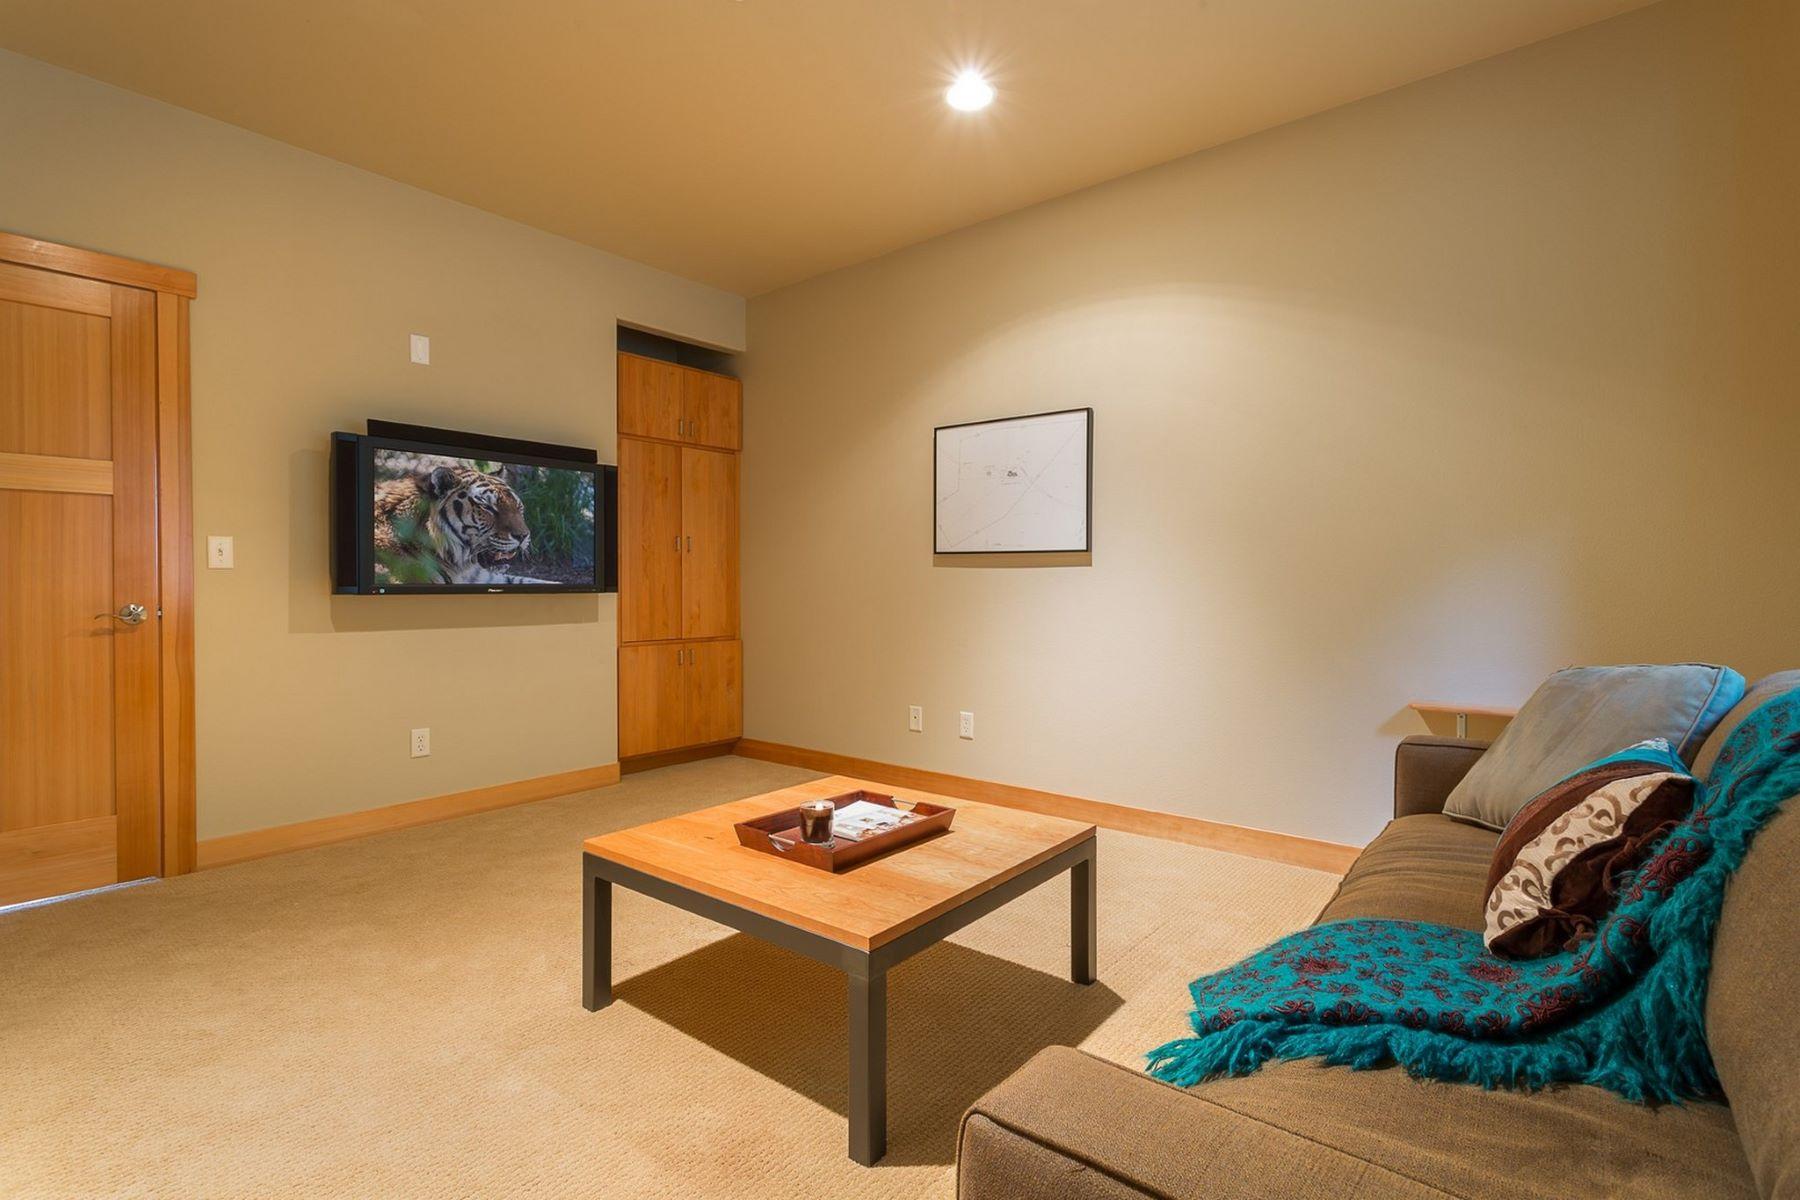 Additional photo for property listing at 1118 Hilty Lane 1118 Hilty Lane Bow, Washington 98232 United States